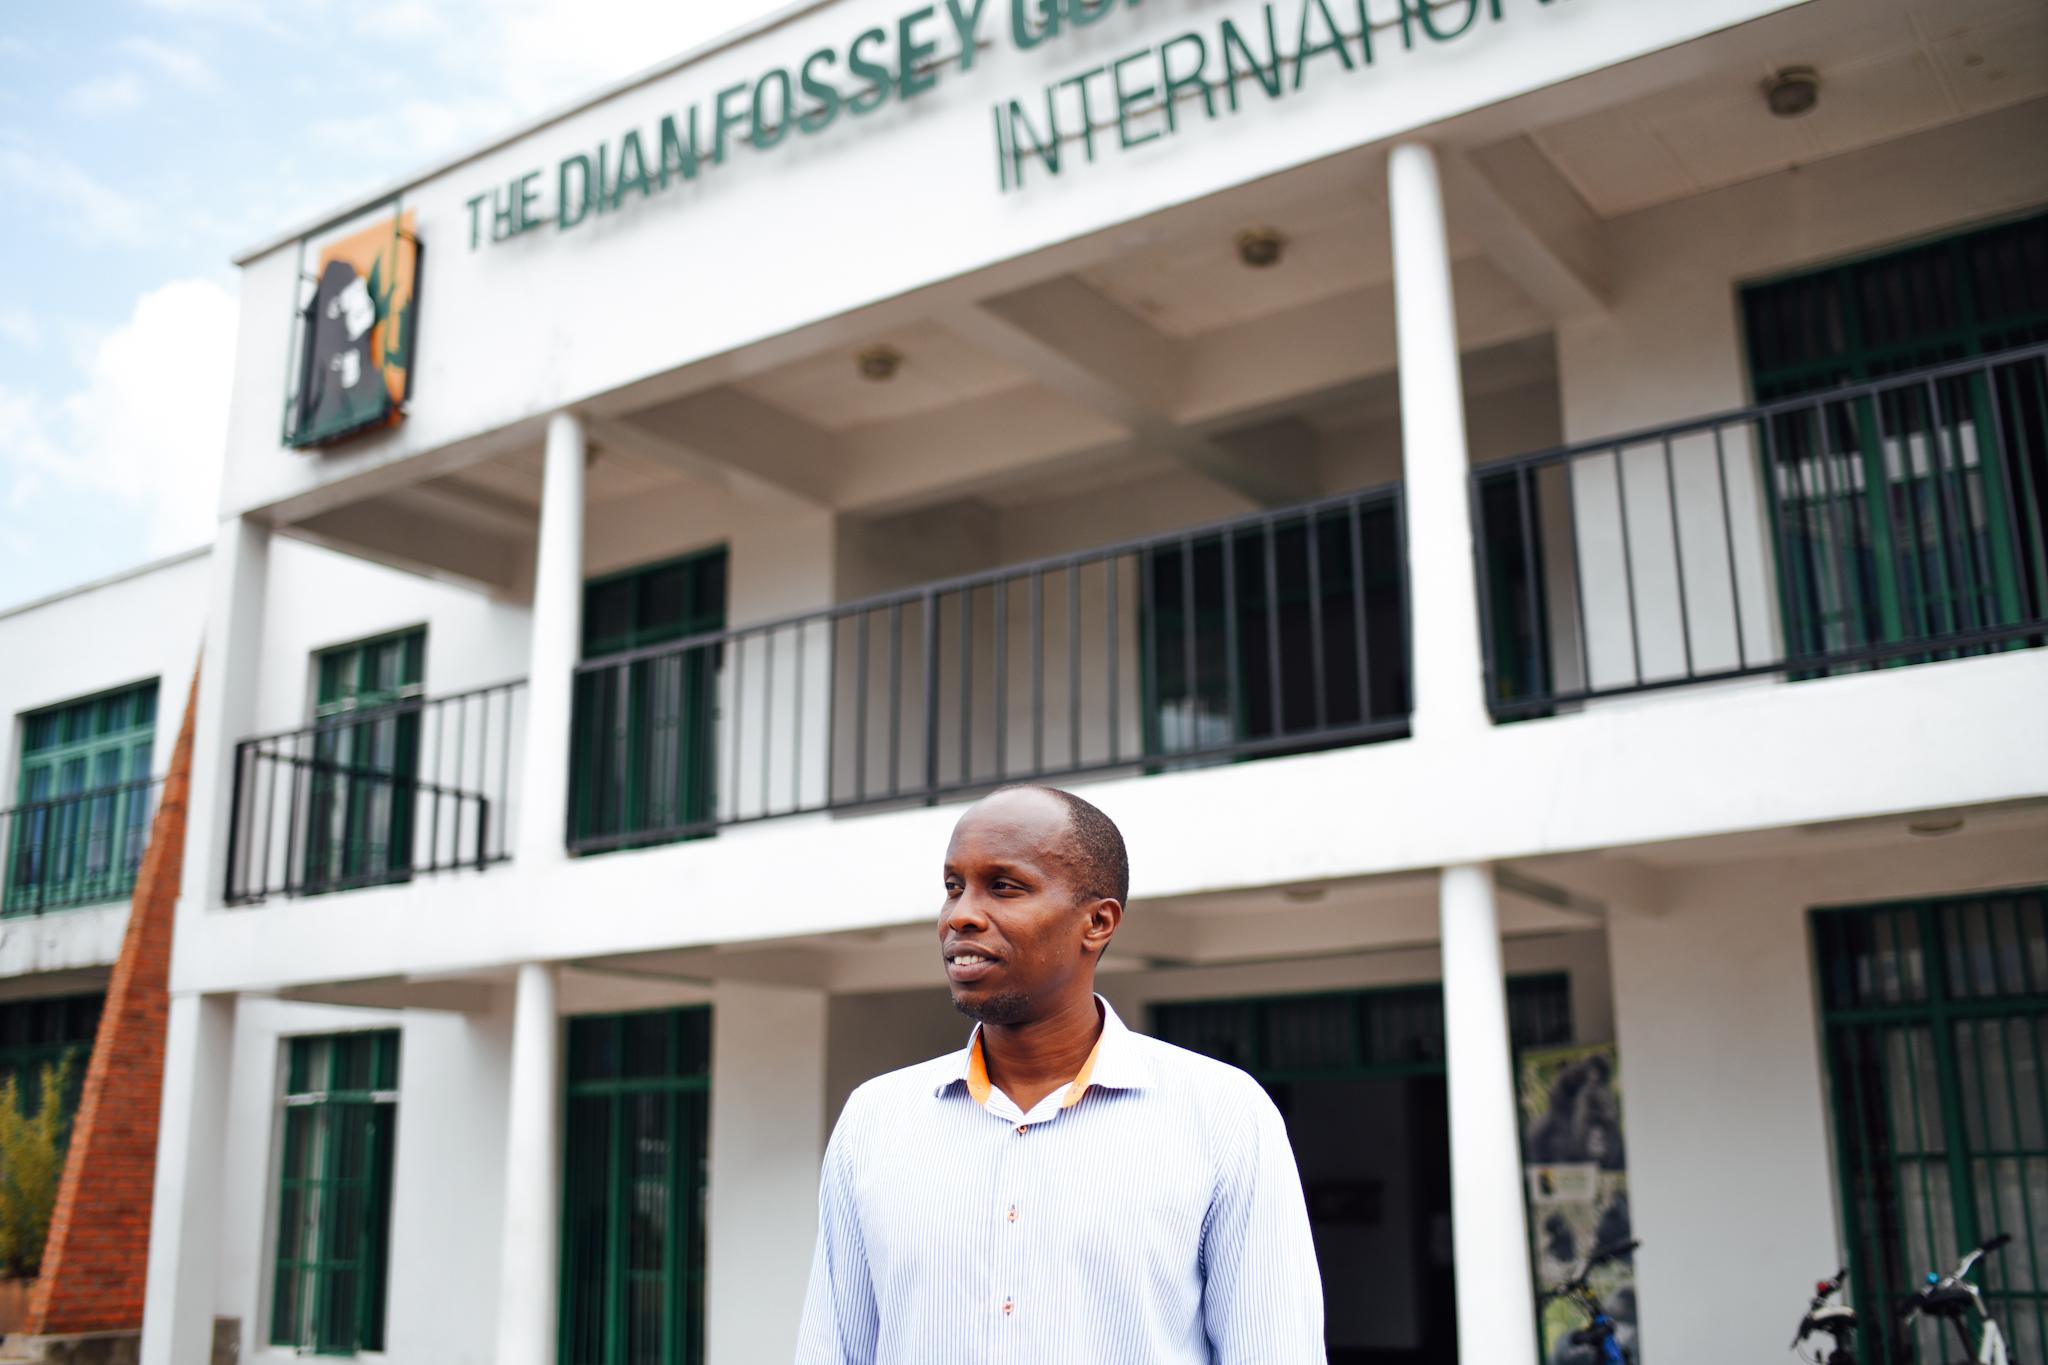 Felix Ndagijimana is the director of the Karisoke Research Center.